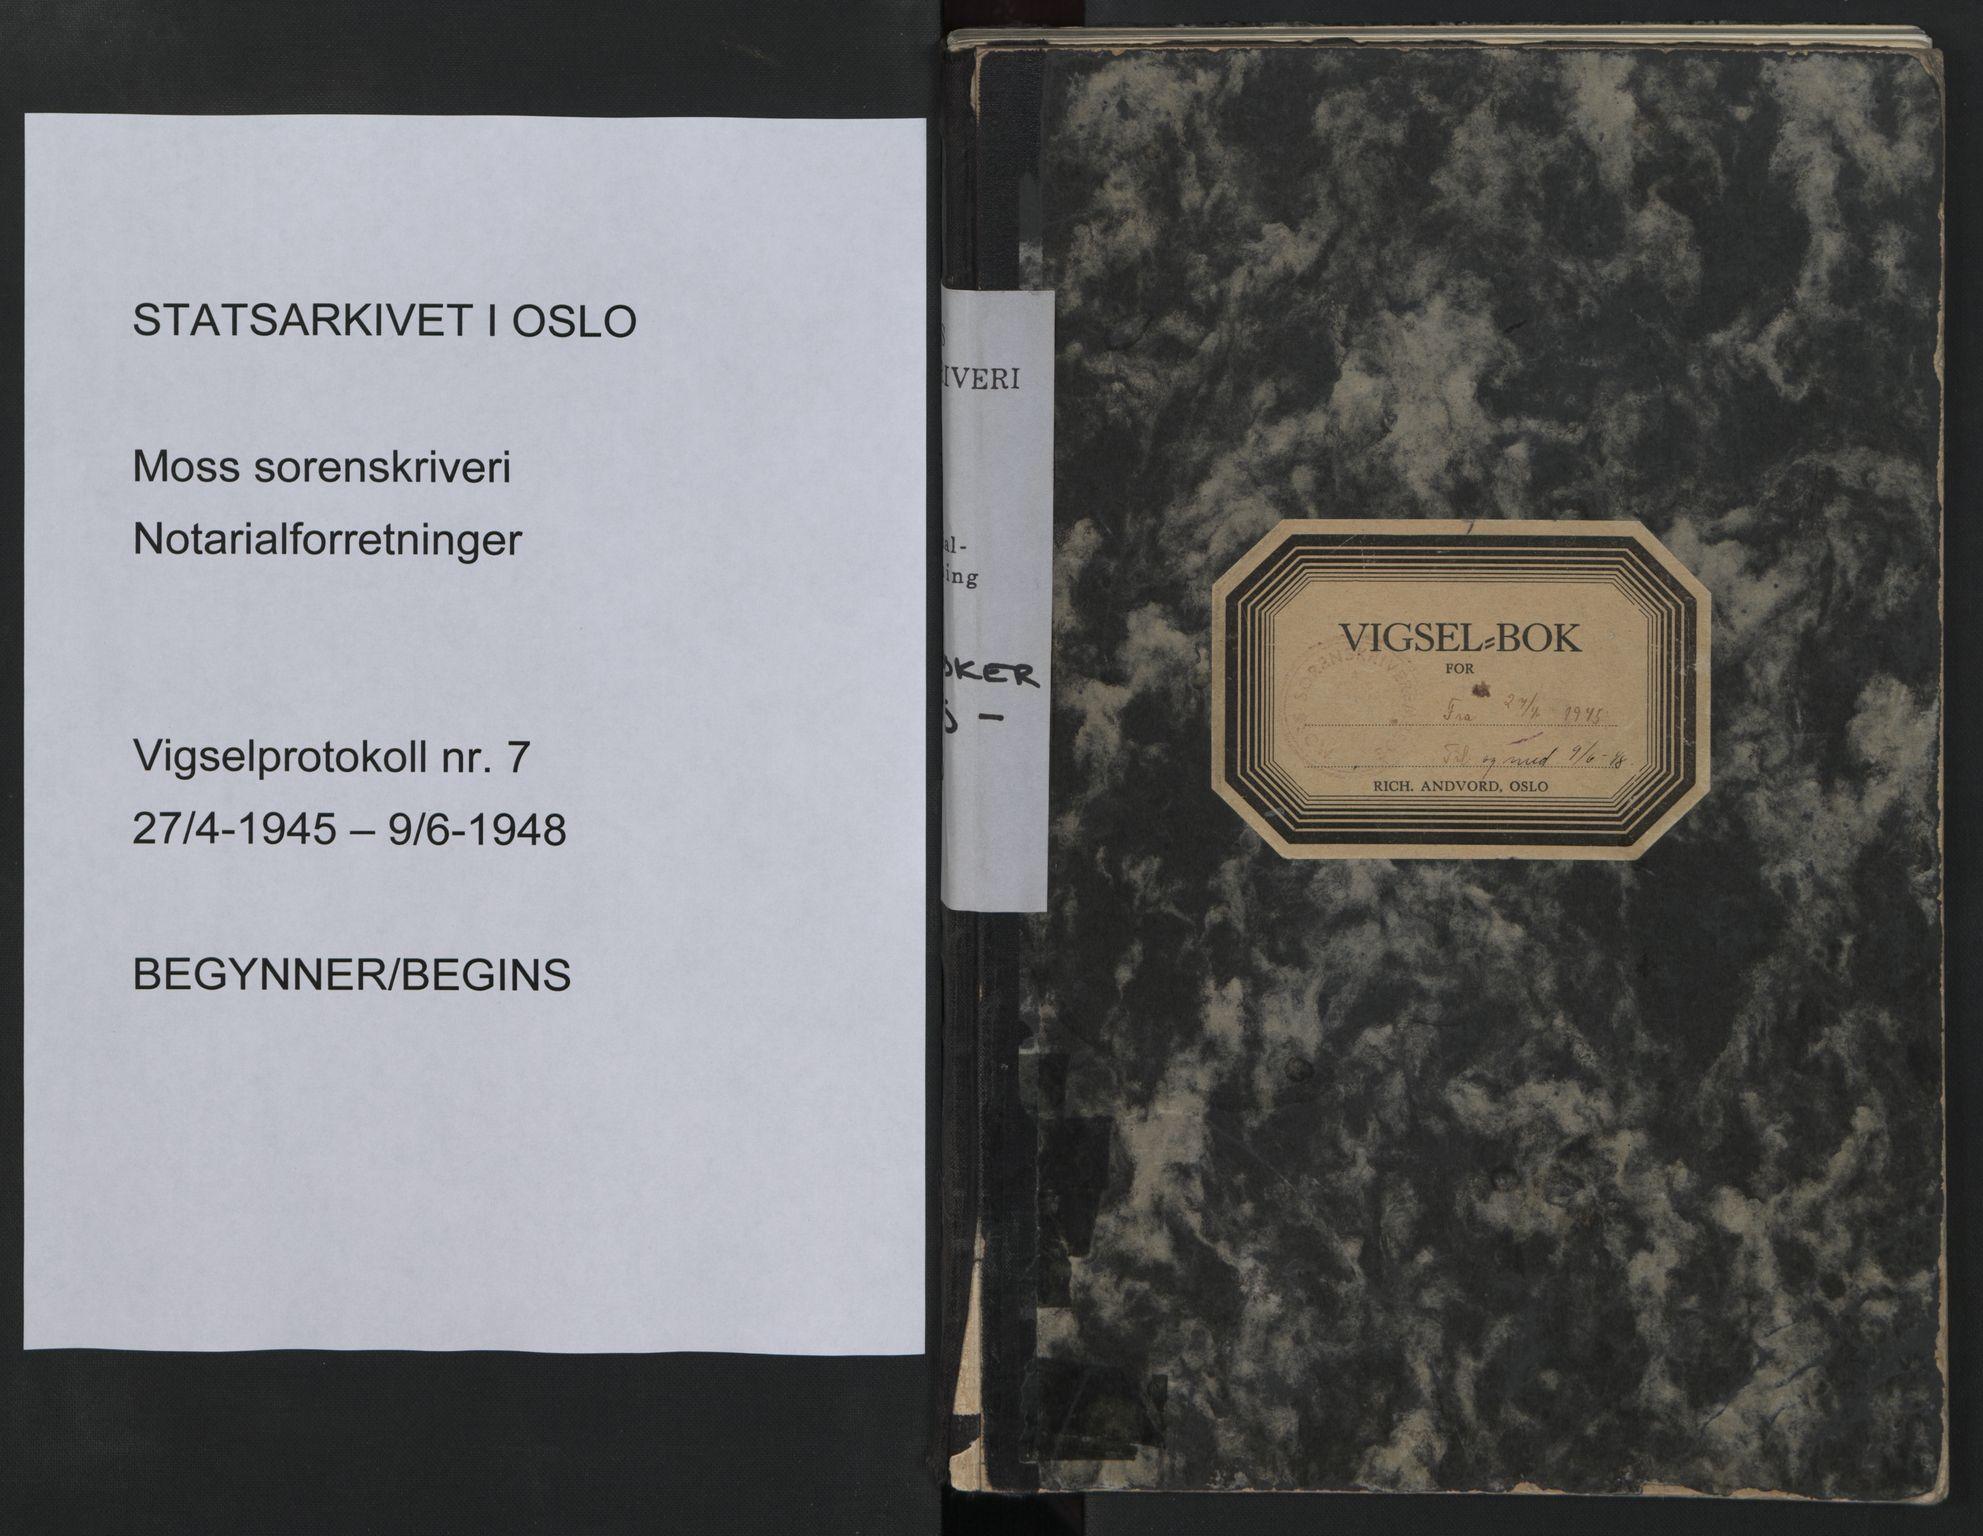 SAO, Moss sorenskriveri, 1945-1948, s. upaginert